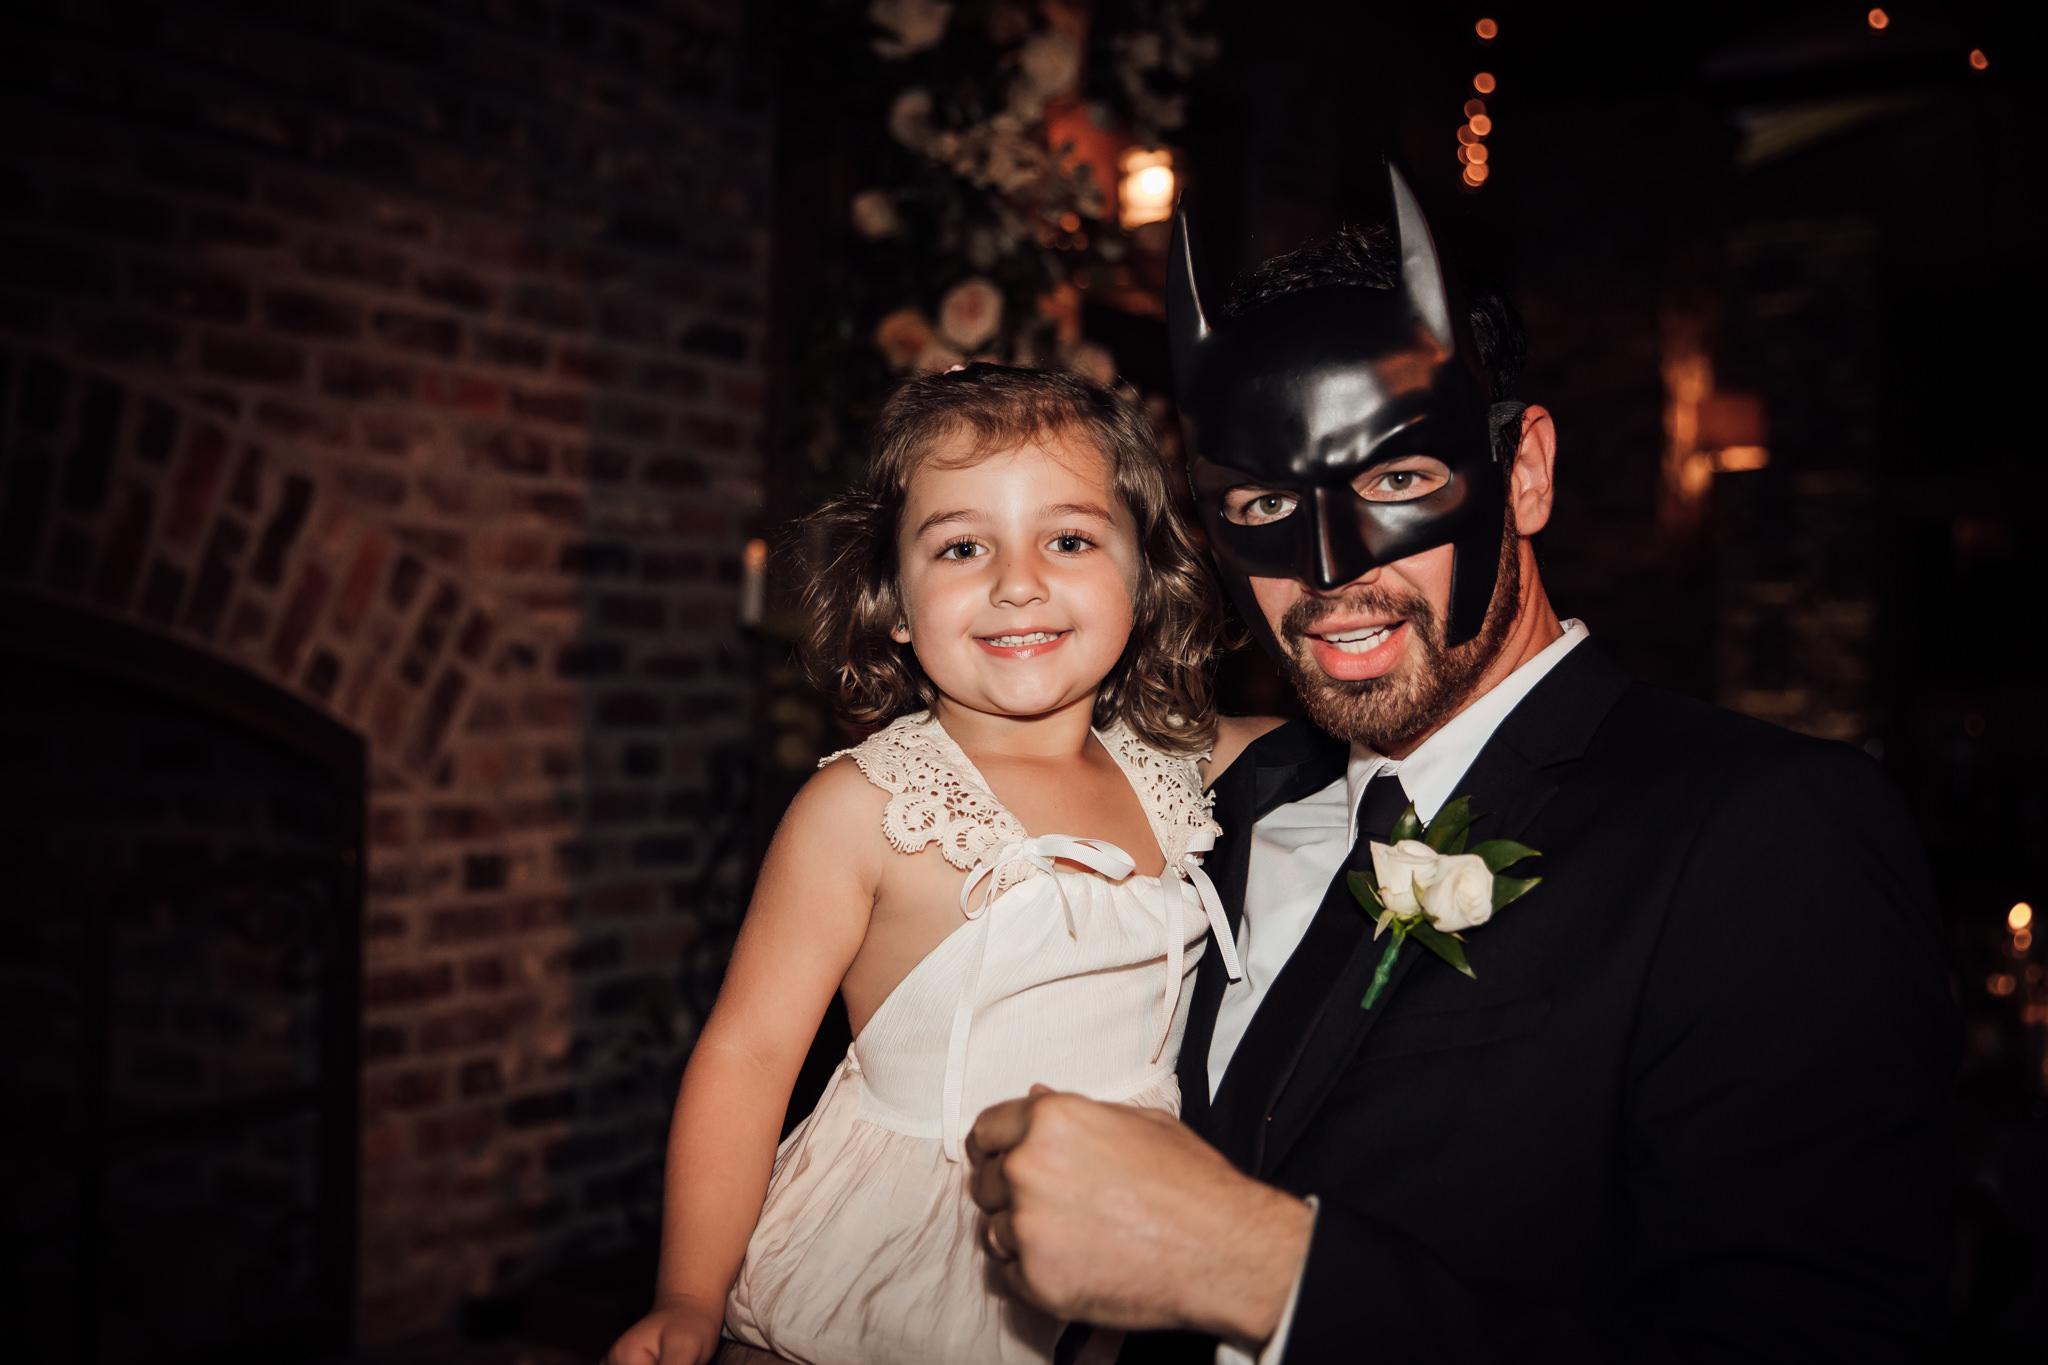 phantom-canyon-brewery-colorado-springs-wedding-photographer-467.jpg